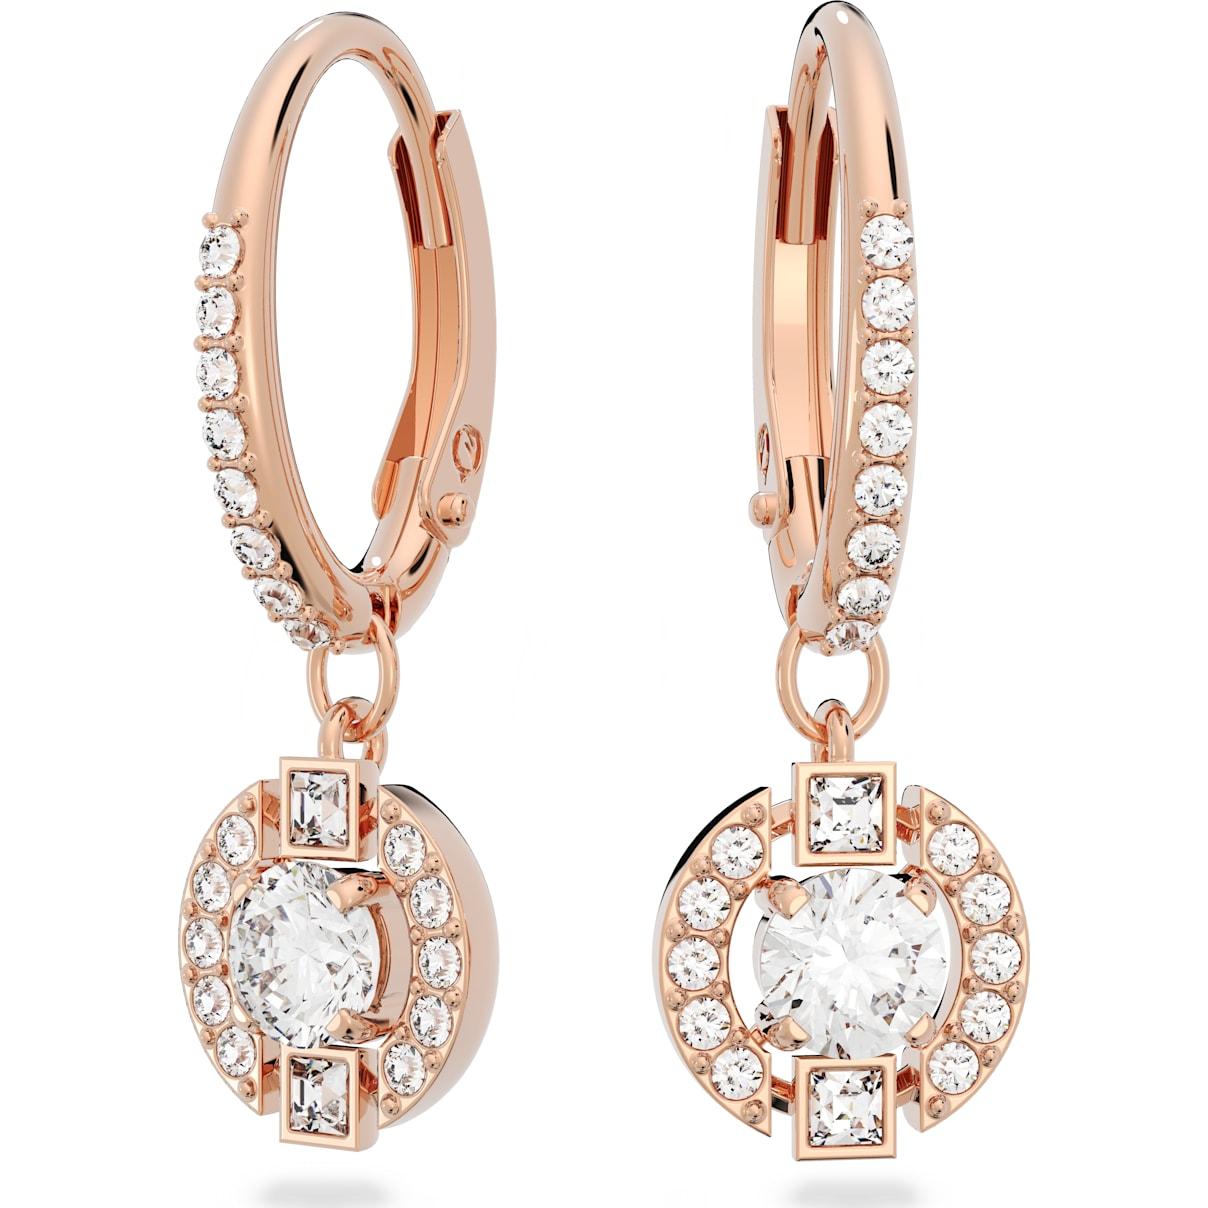 Swarovski Swarovski Sparkling Dance Round Pierced Earrings, White, Rose-gold tone plated